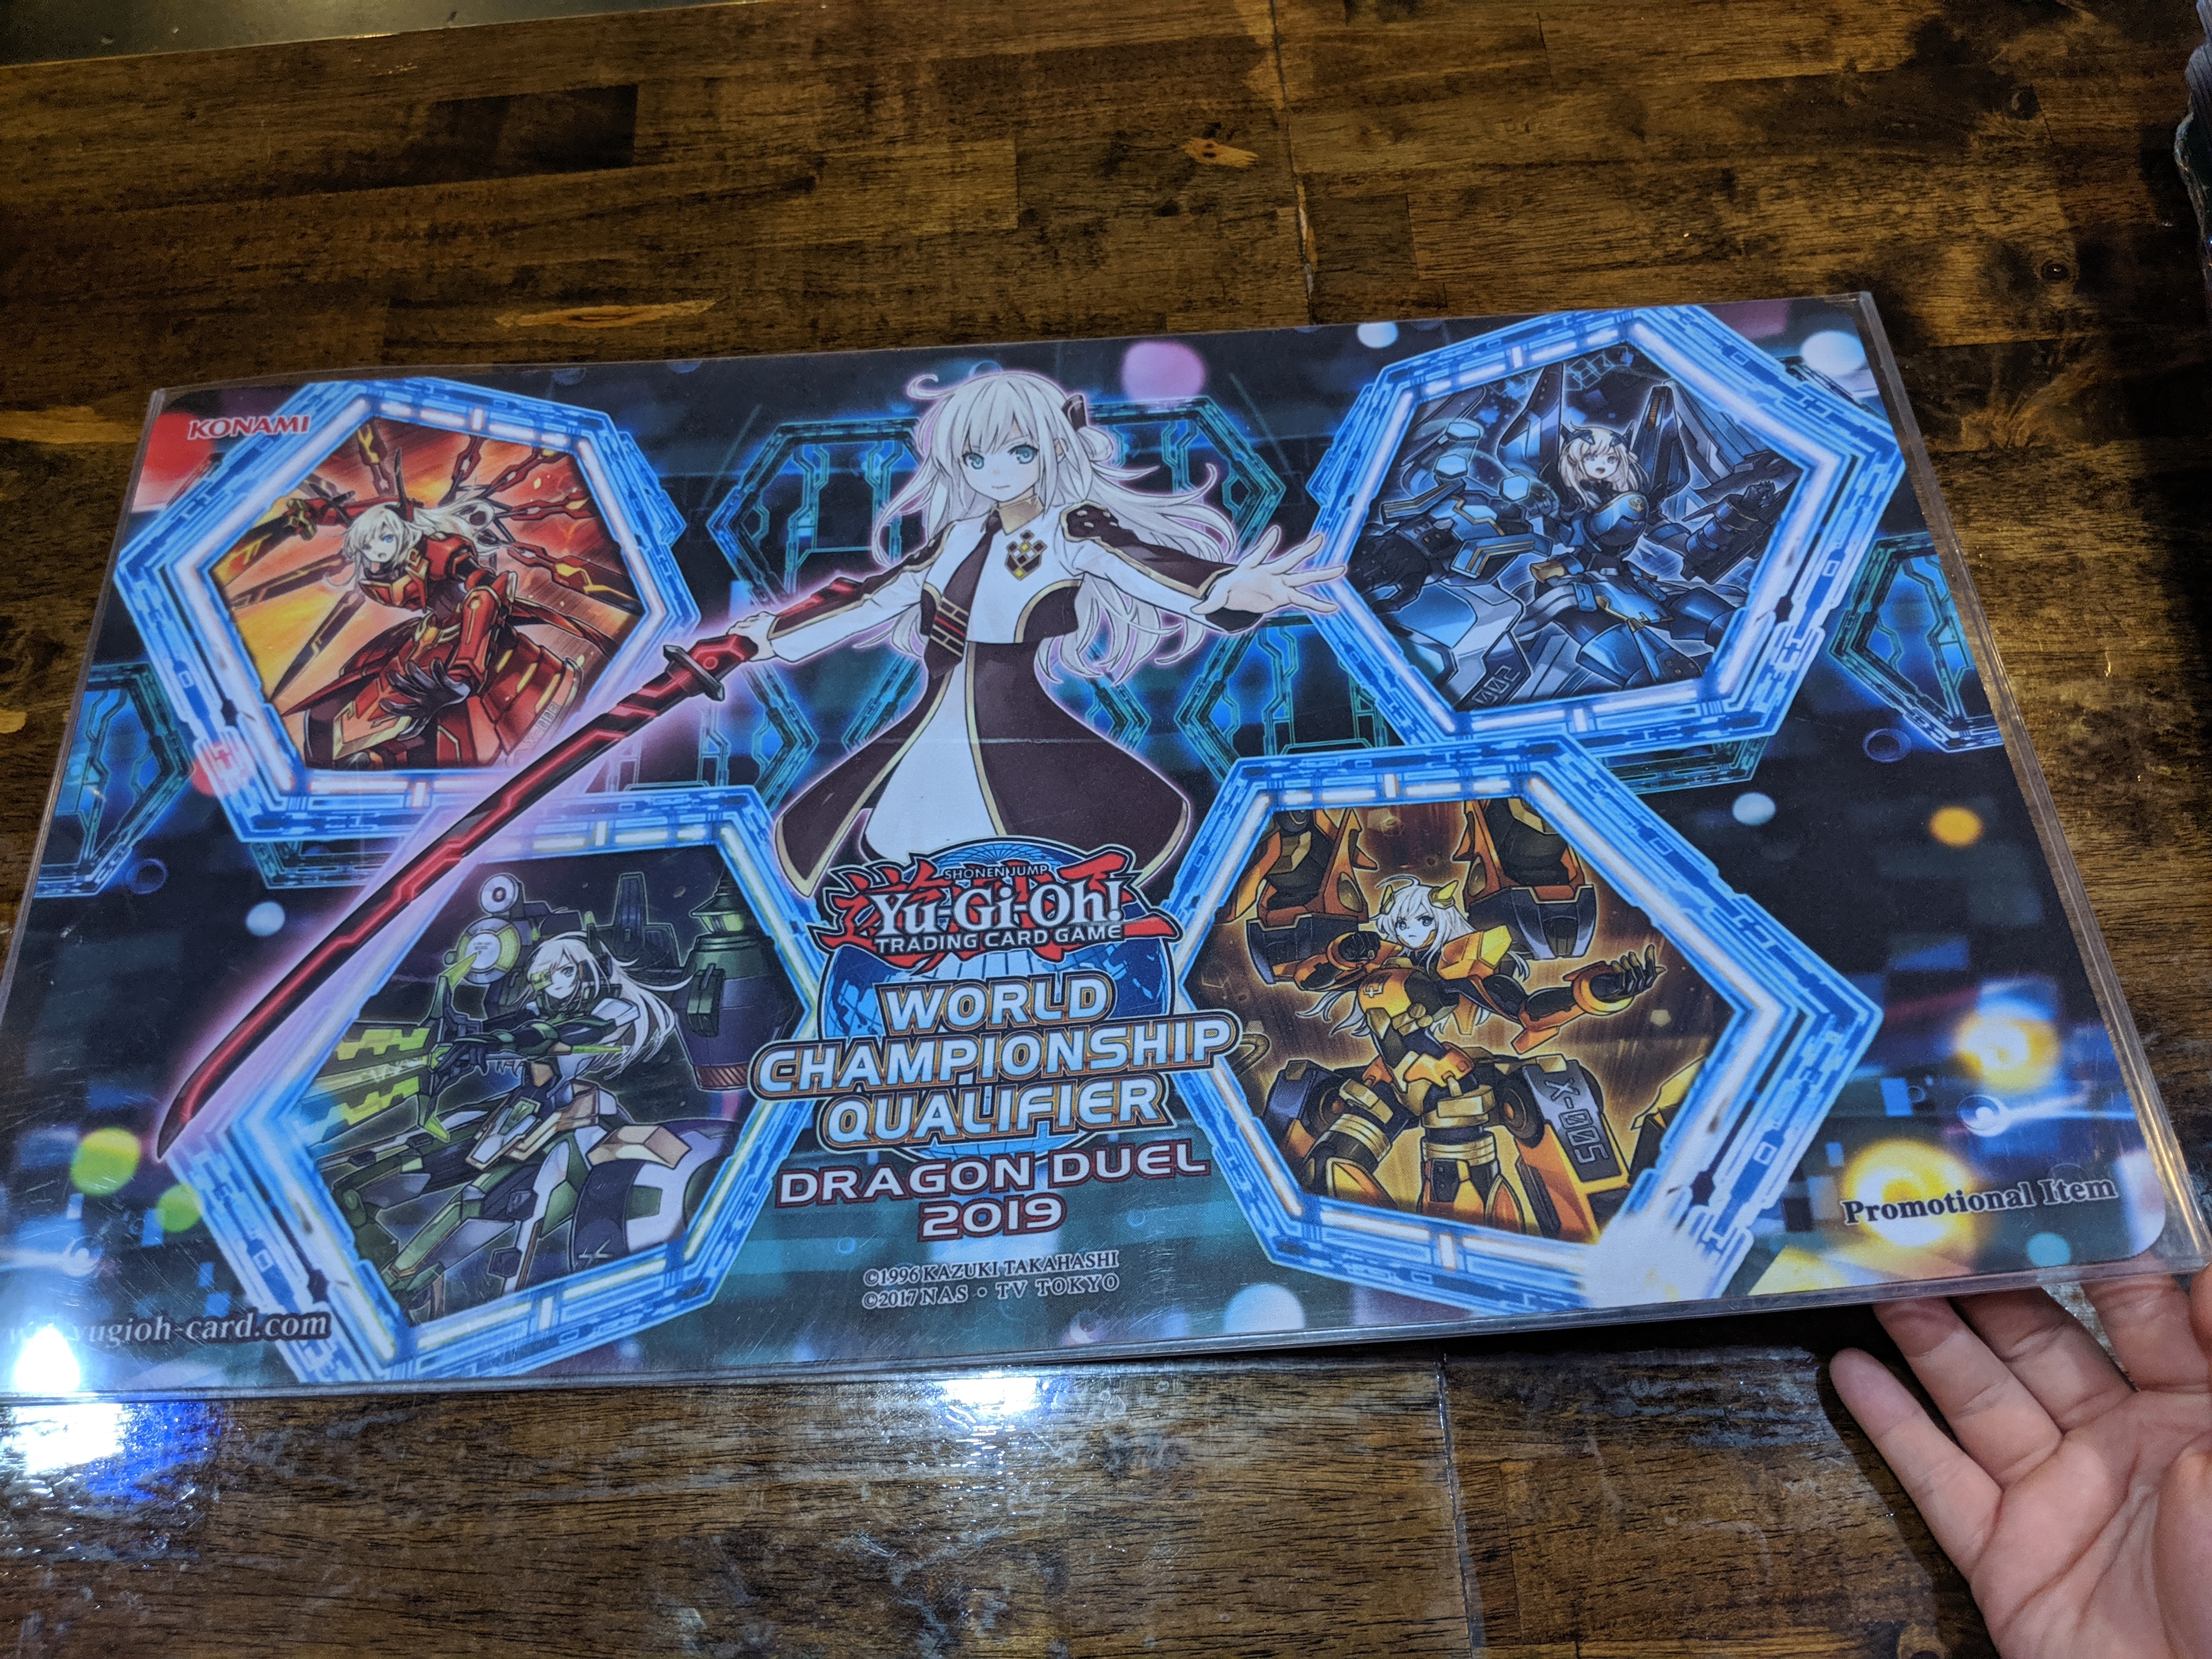 Yugioh 2019 Dragon Duel WCQ TOP CUT Playmat Sky Strikers